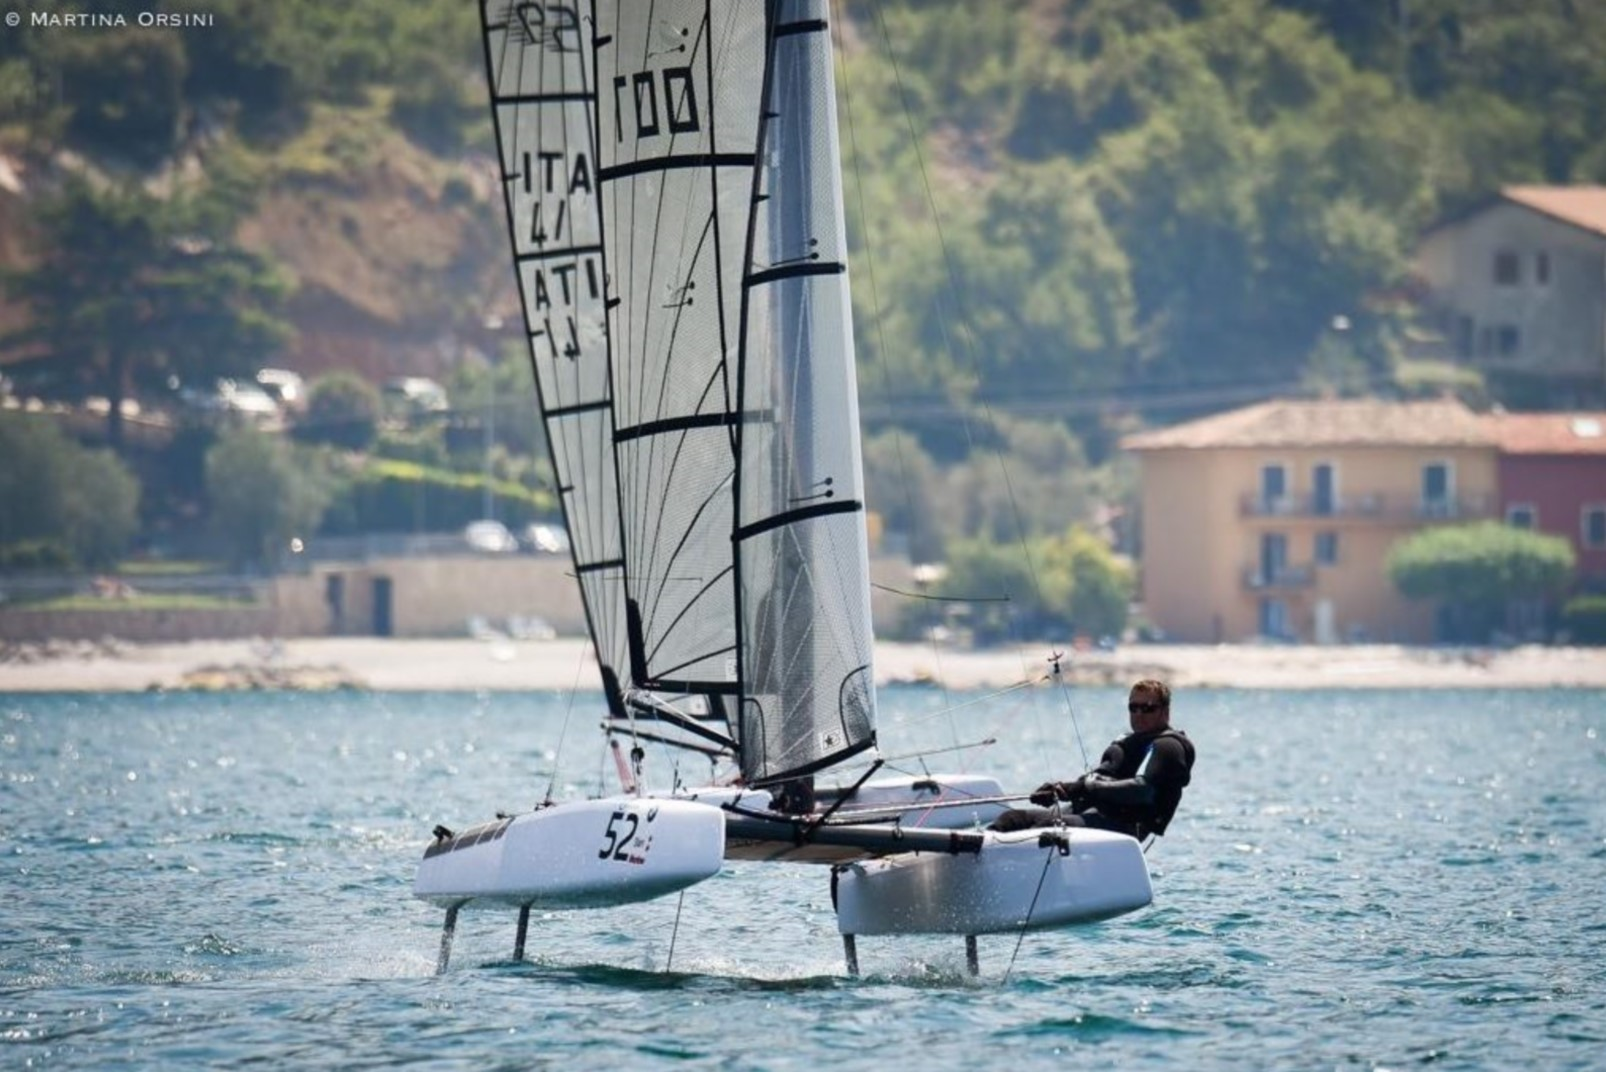 S9 catamaran foiling yacht